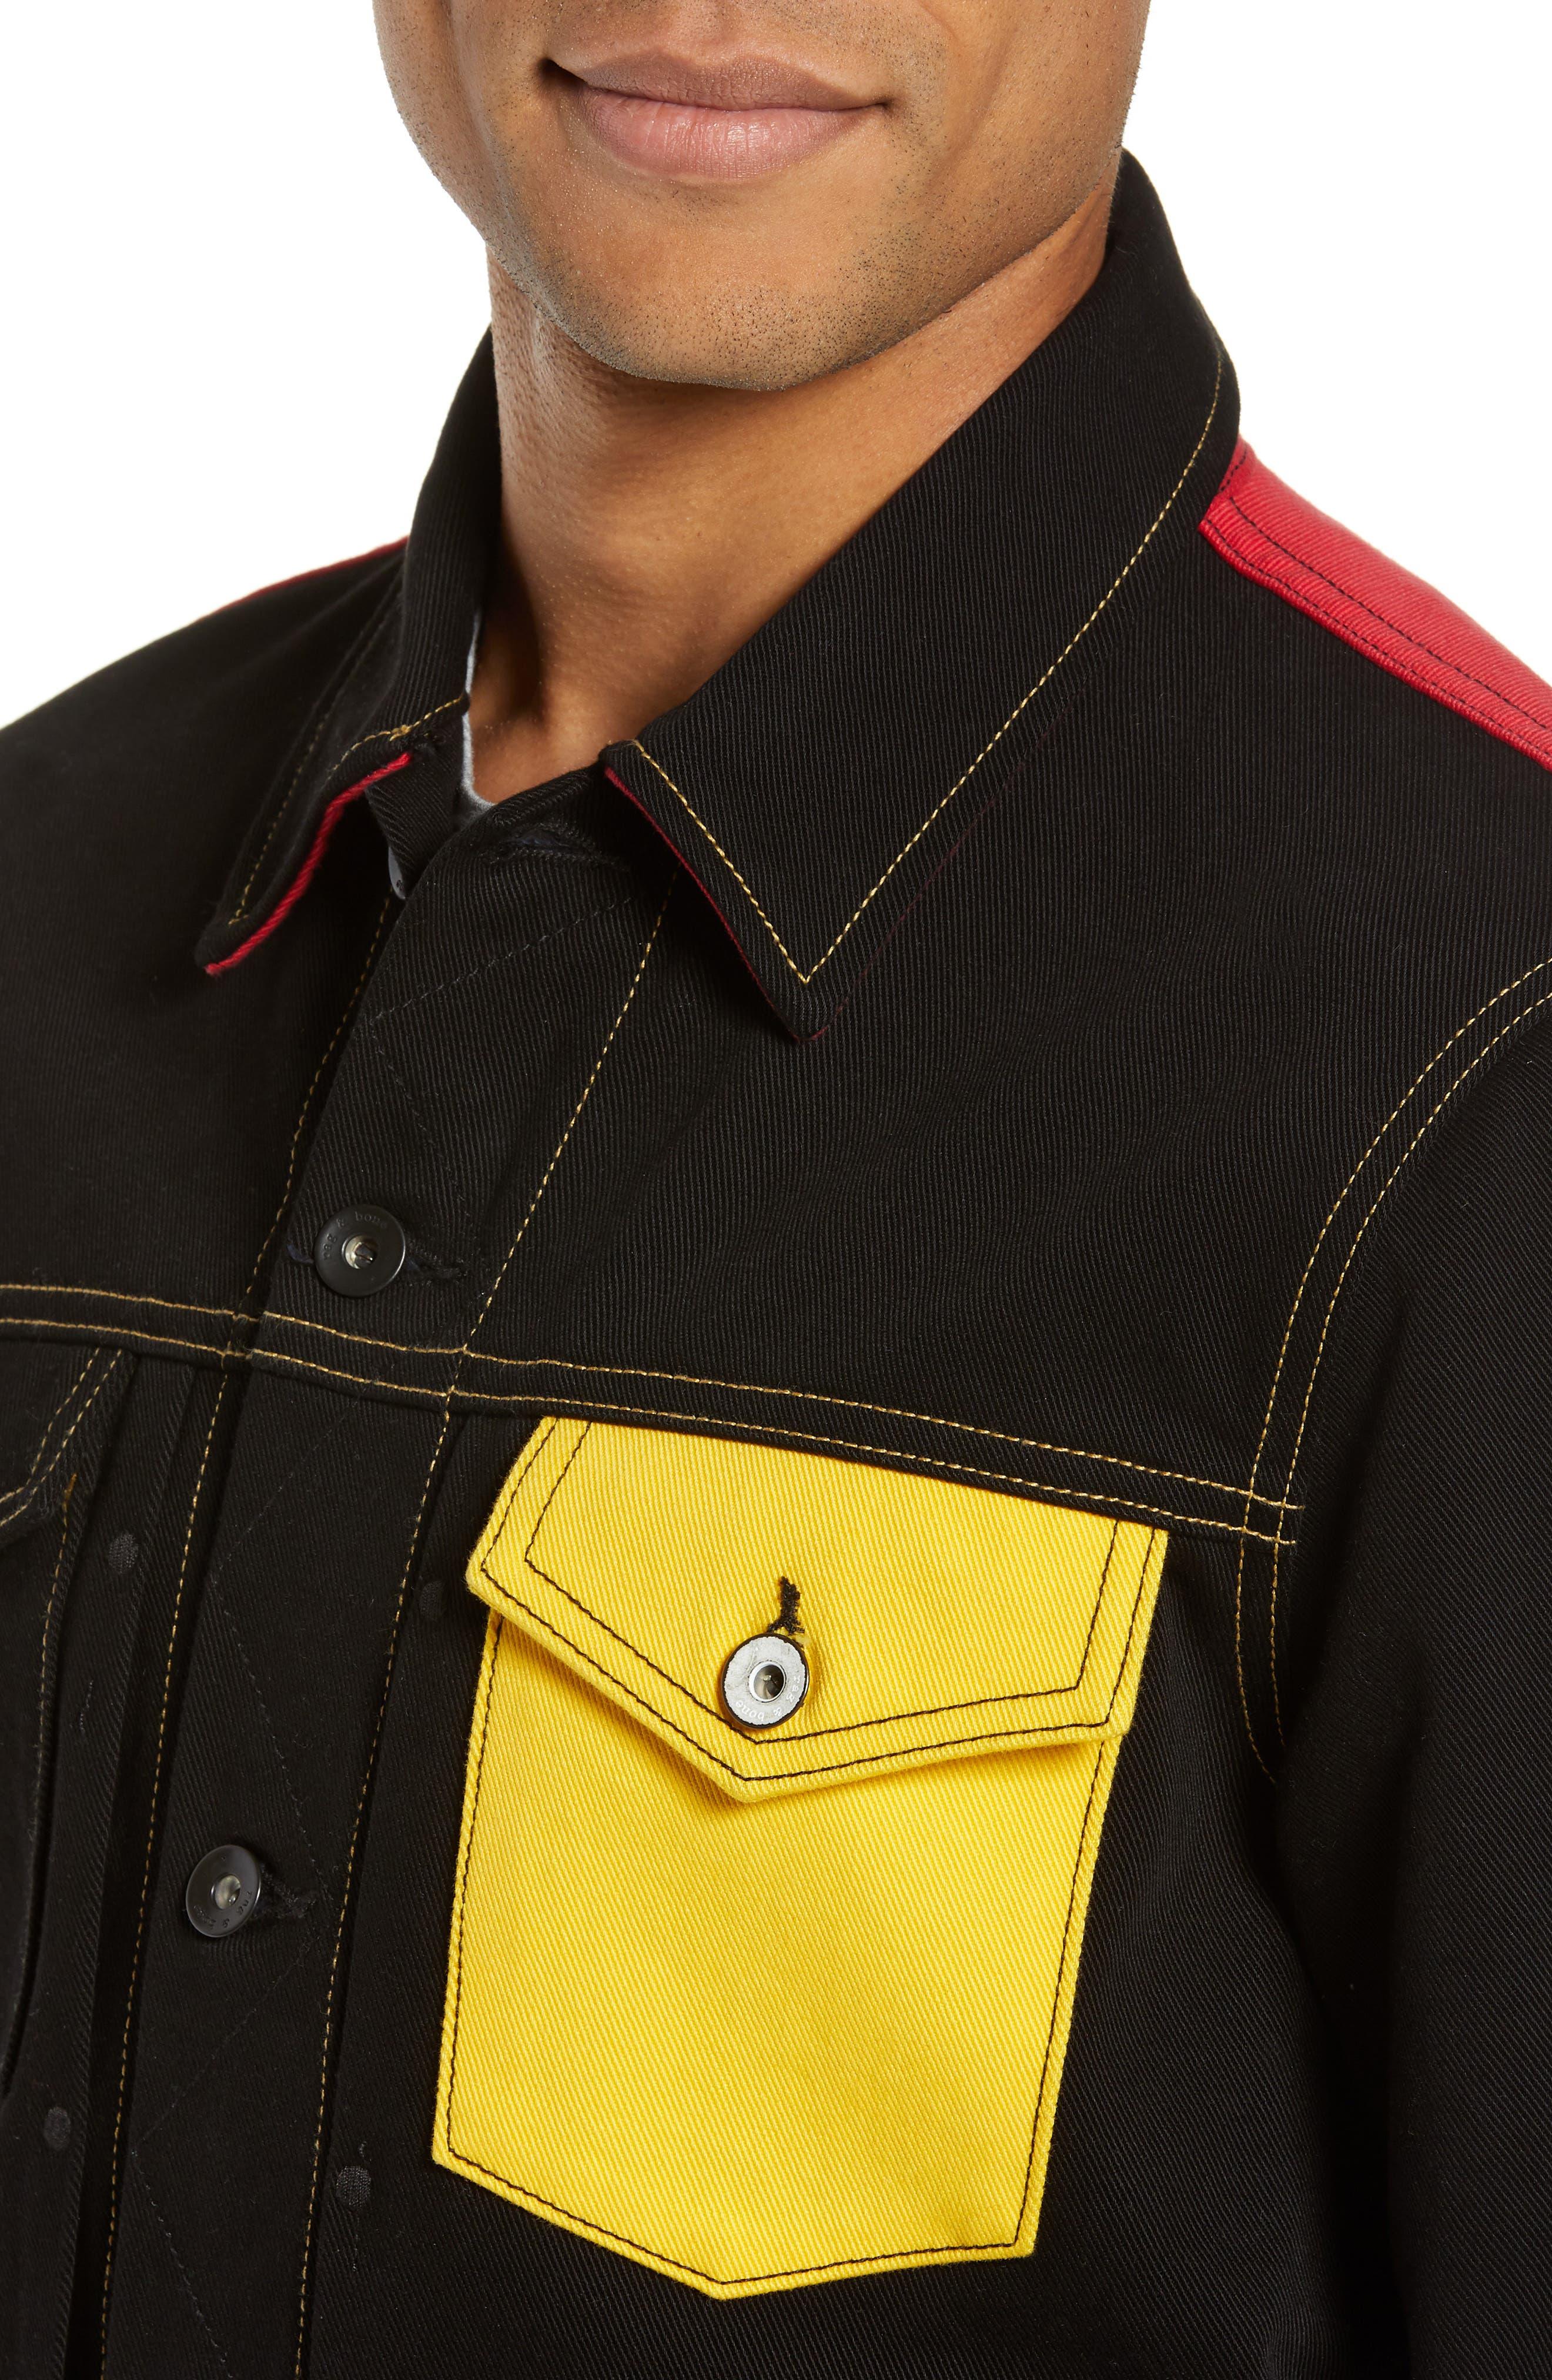 Mickey Mouse Unisex Denim Jacket,                             Alternate thumbnail 4, color,                             001